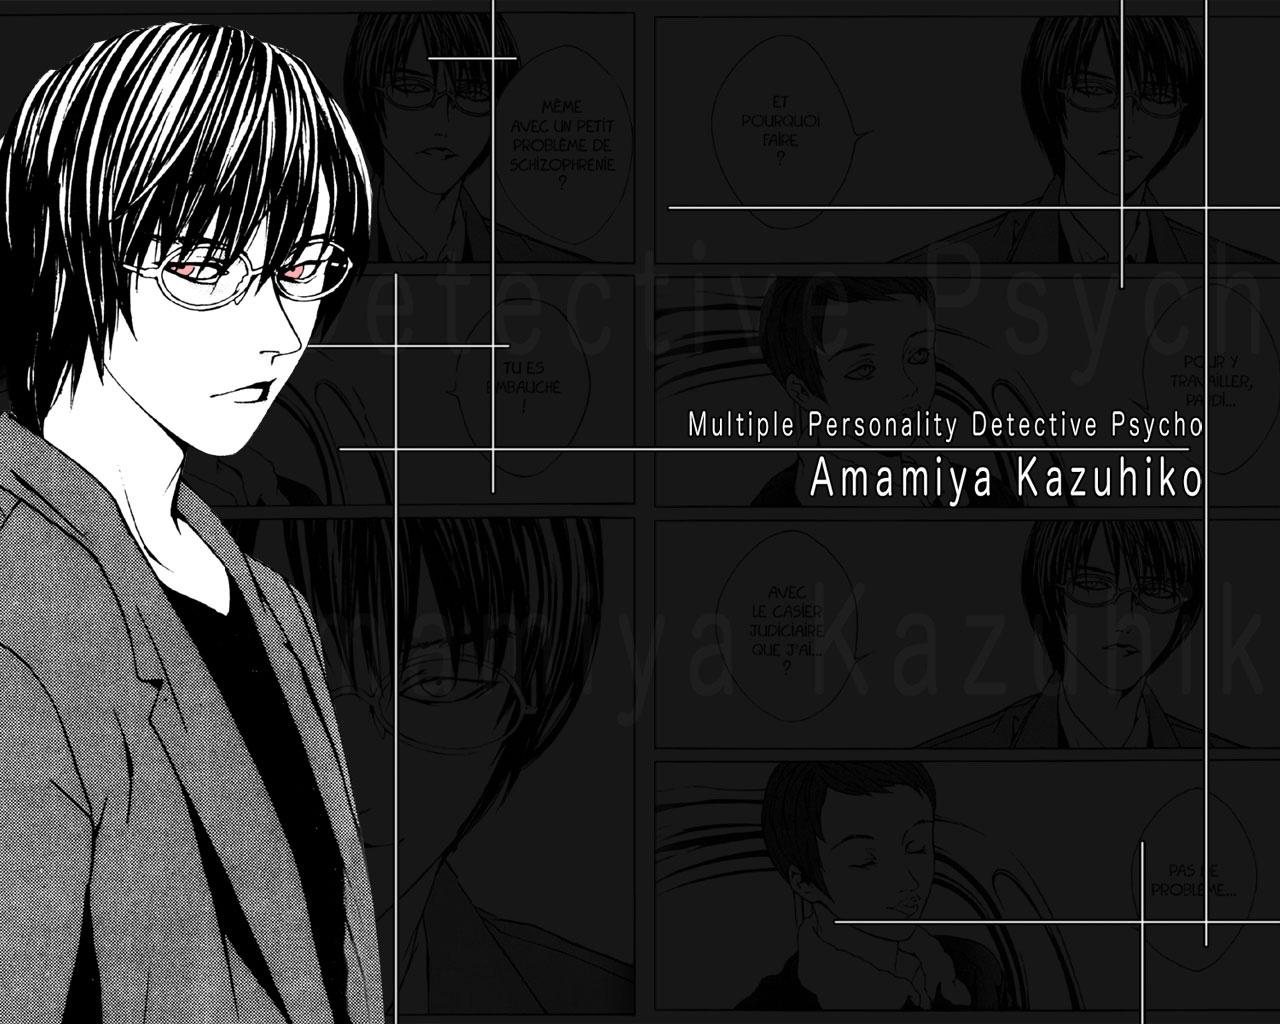 MPD Psycho - Eiji Otsuka - Sho-U Tajima Mpd-psycho%2813%29